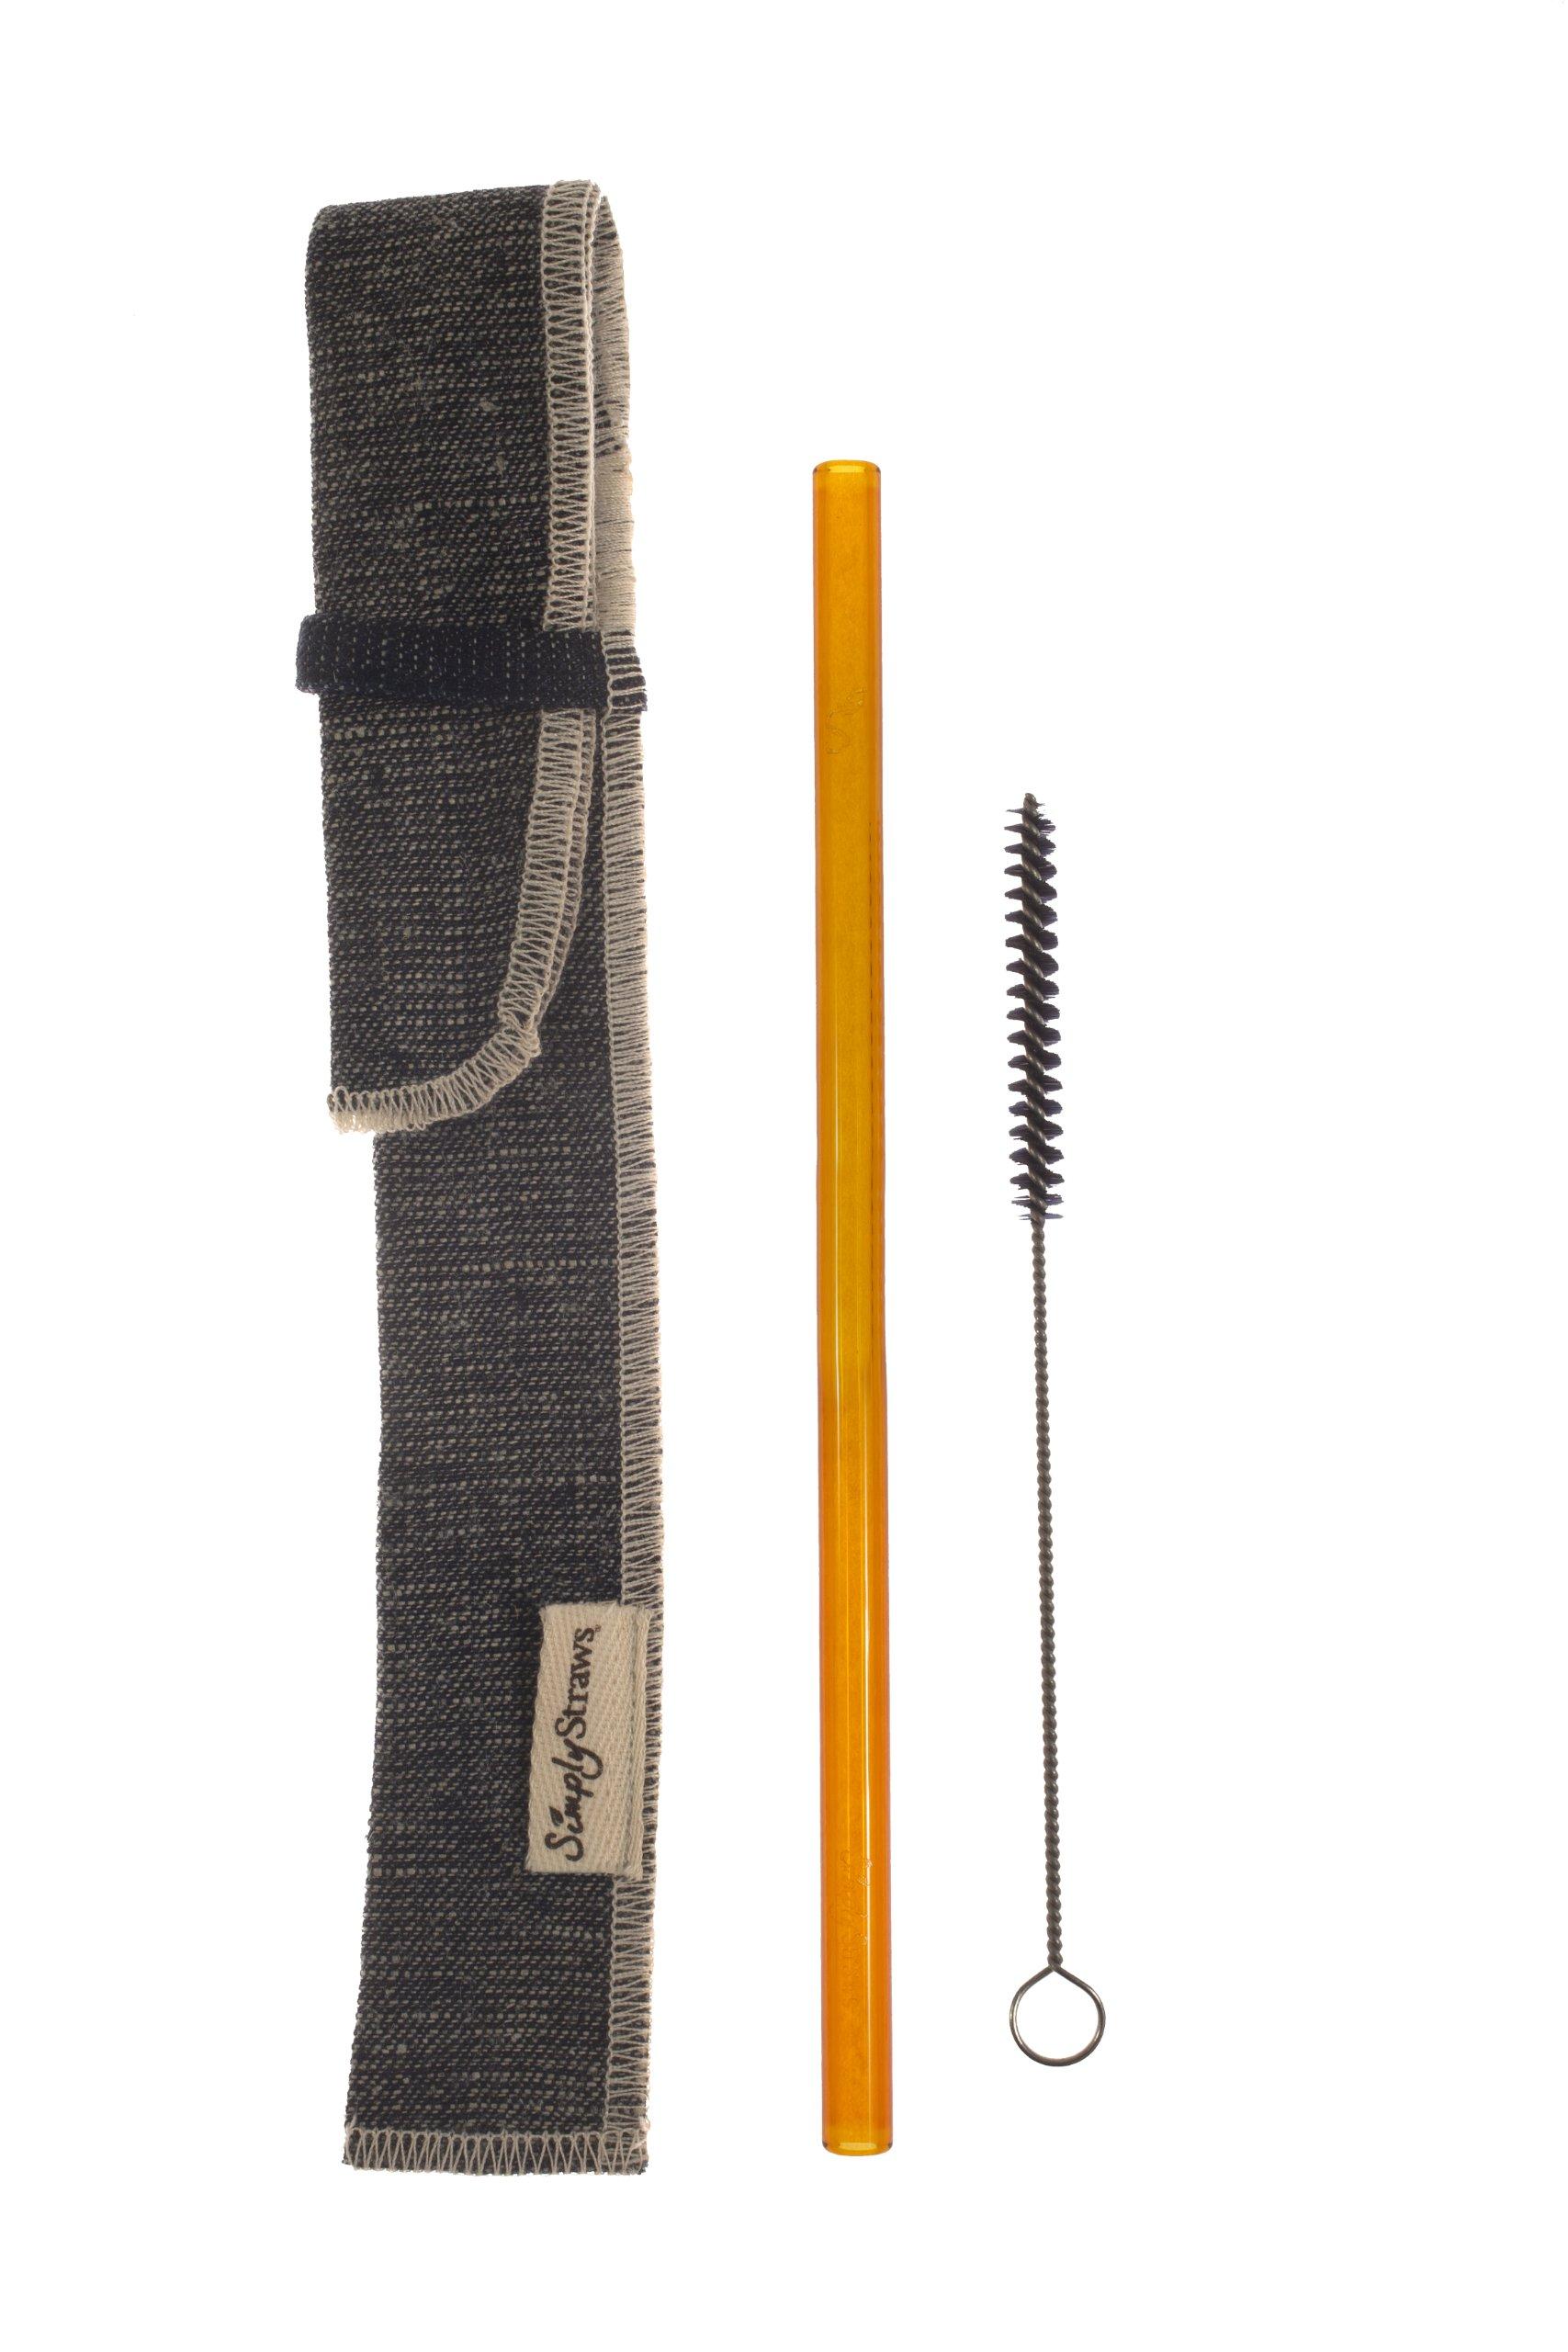 Simply Straws Single Sleeve Set, 1 Classic 8-Inch Amber Straw, 1 Reverse Denim Sleeve and 1 Brush